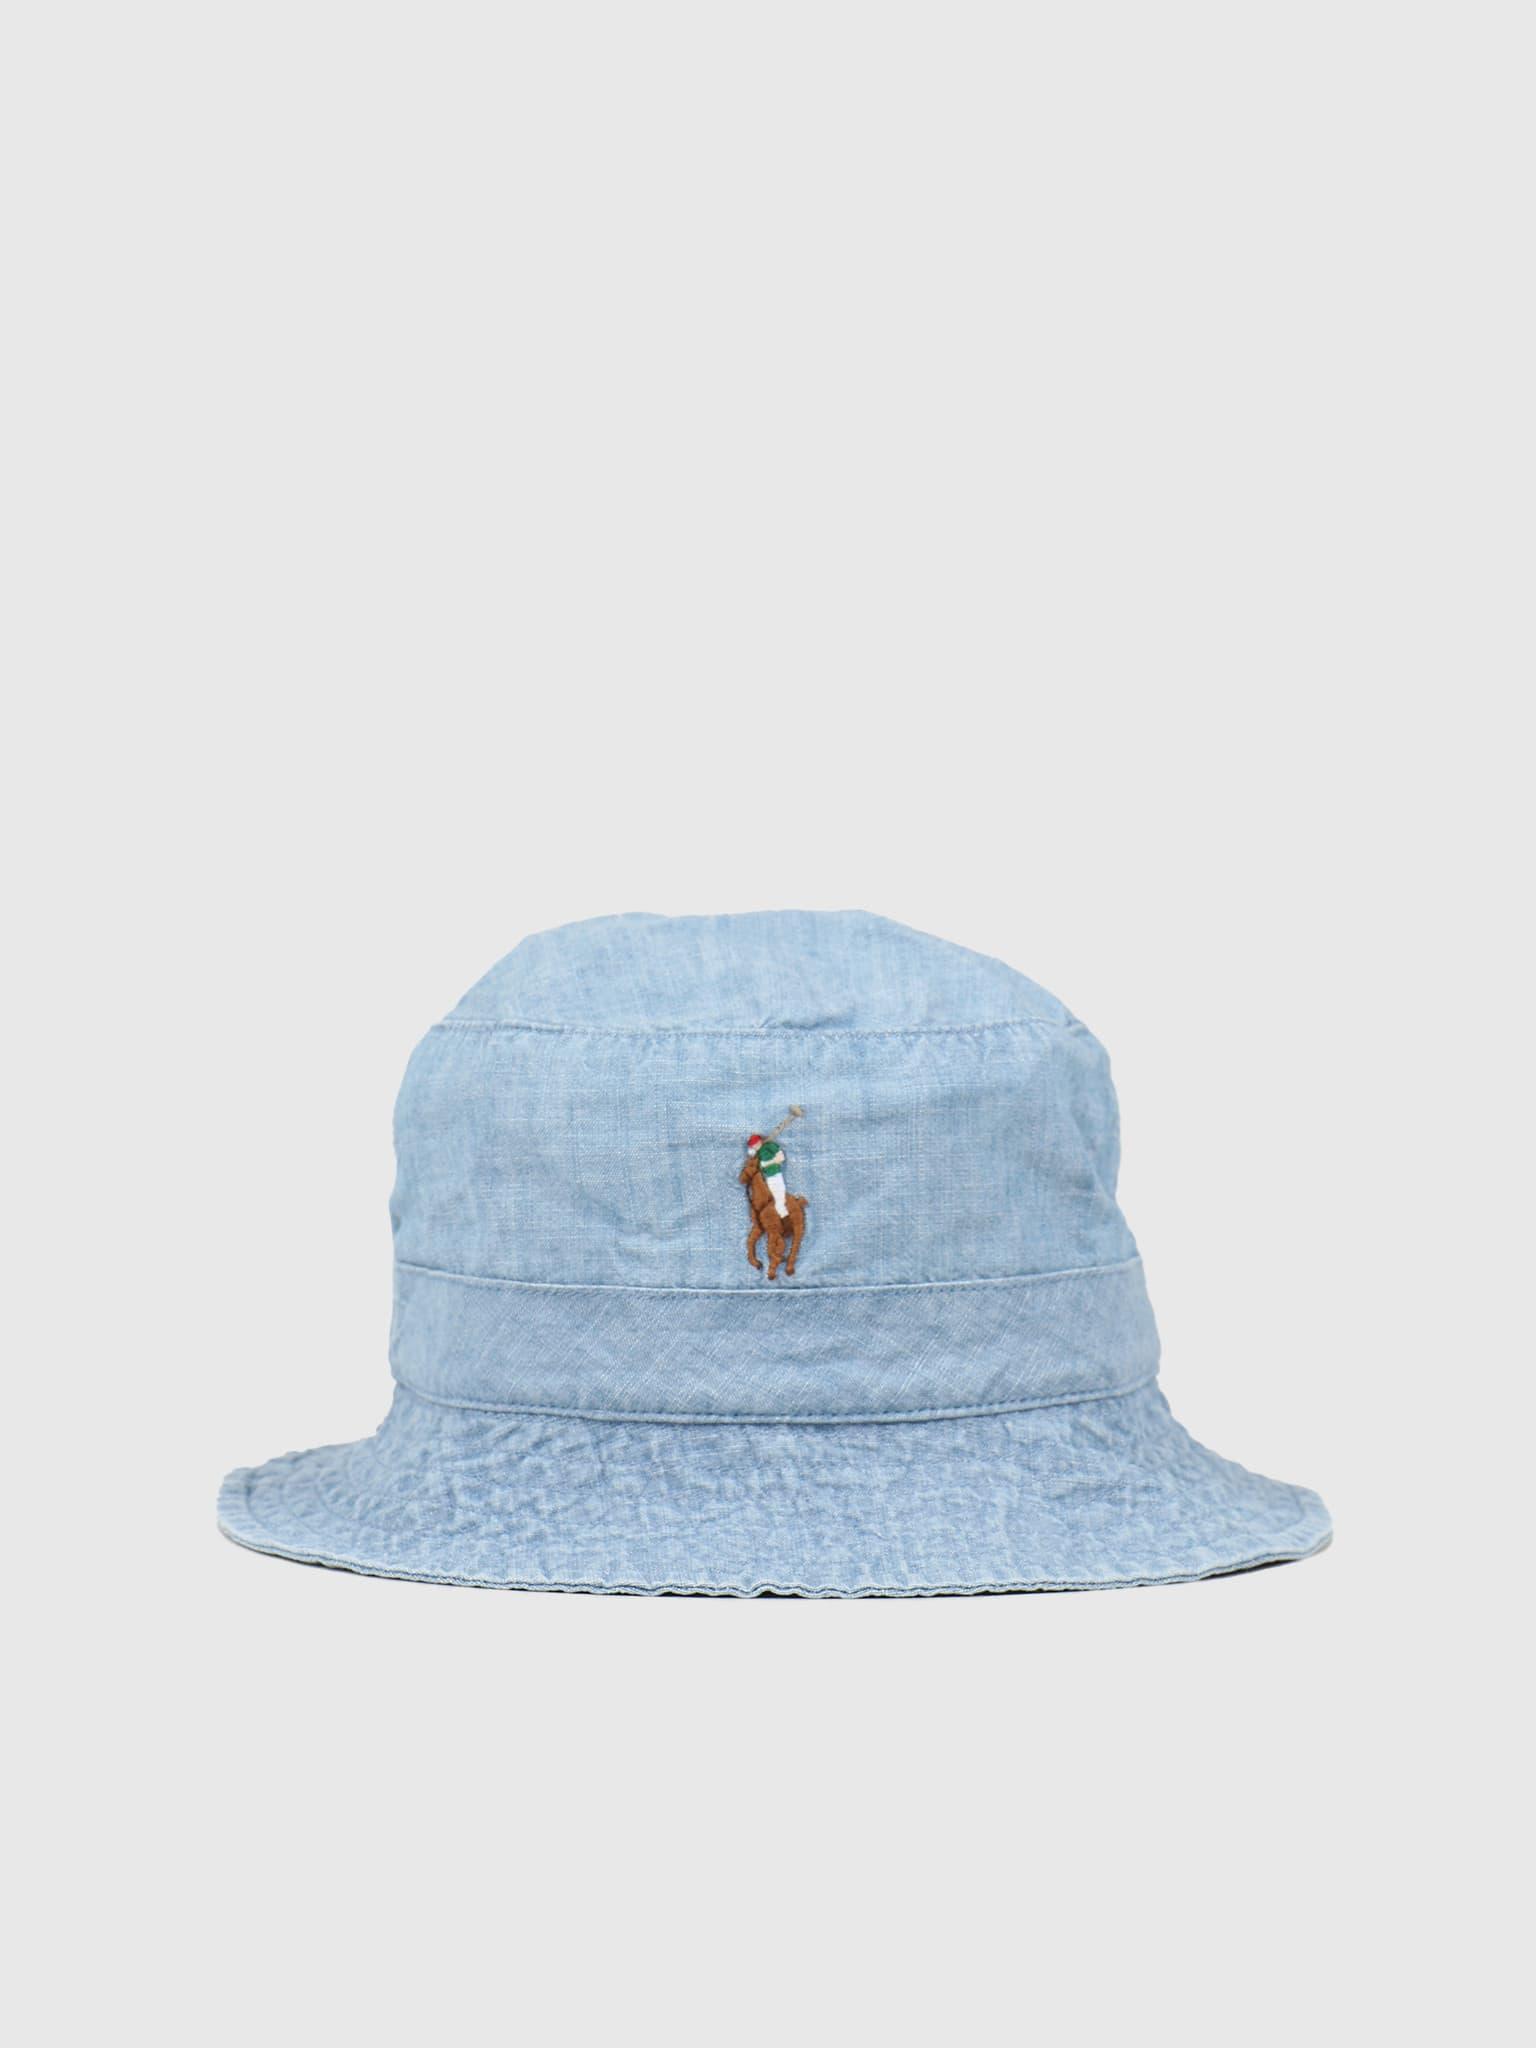 Loft Bucket Hat Blue Chambray 710798566001